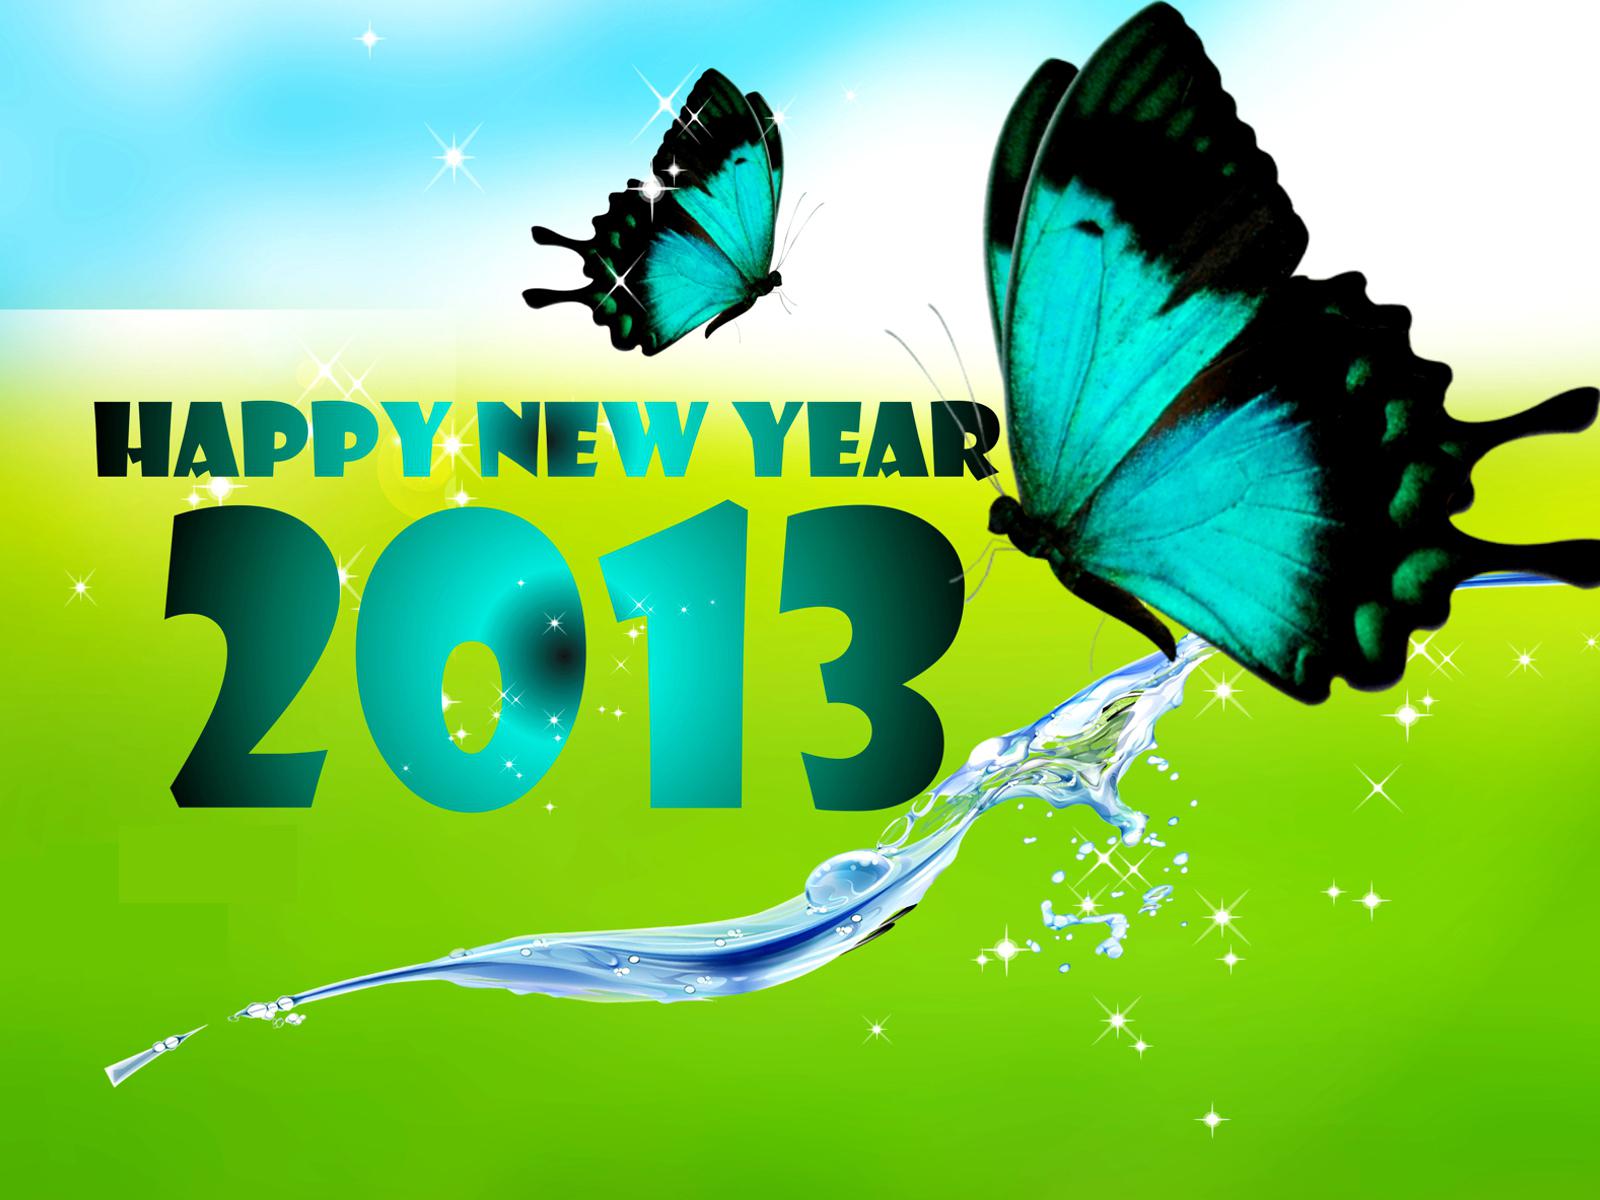 Thiệp Tết 2013 đẹp | thiệp tết đẹp 2013, thiệp tết 2013, bộ mẫu thiệp tết đẹp, thiệp xuân 2013, thiệp tết 2013, (23)